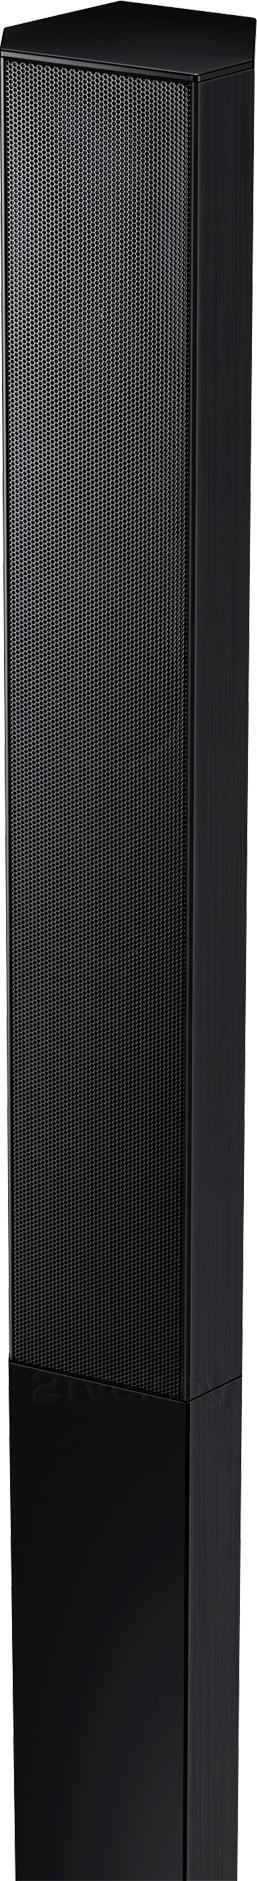 HT-H5530K/RU 21vek.by 3704000.000